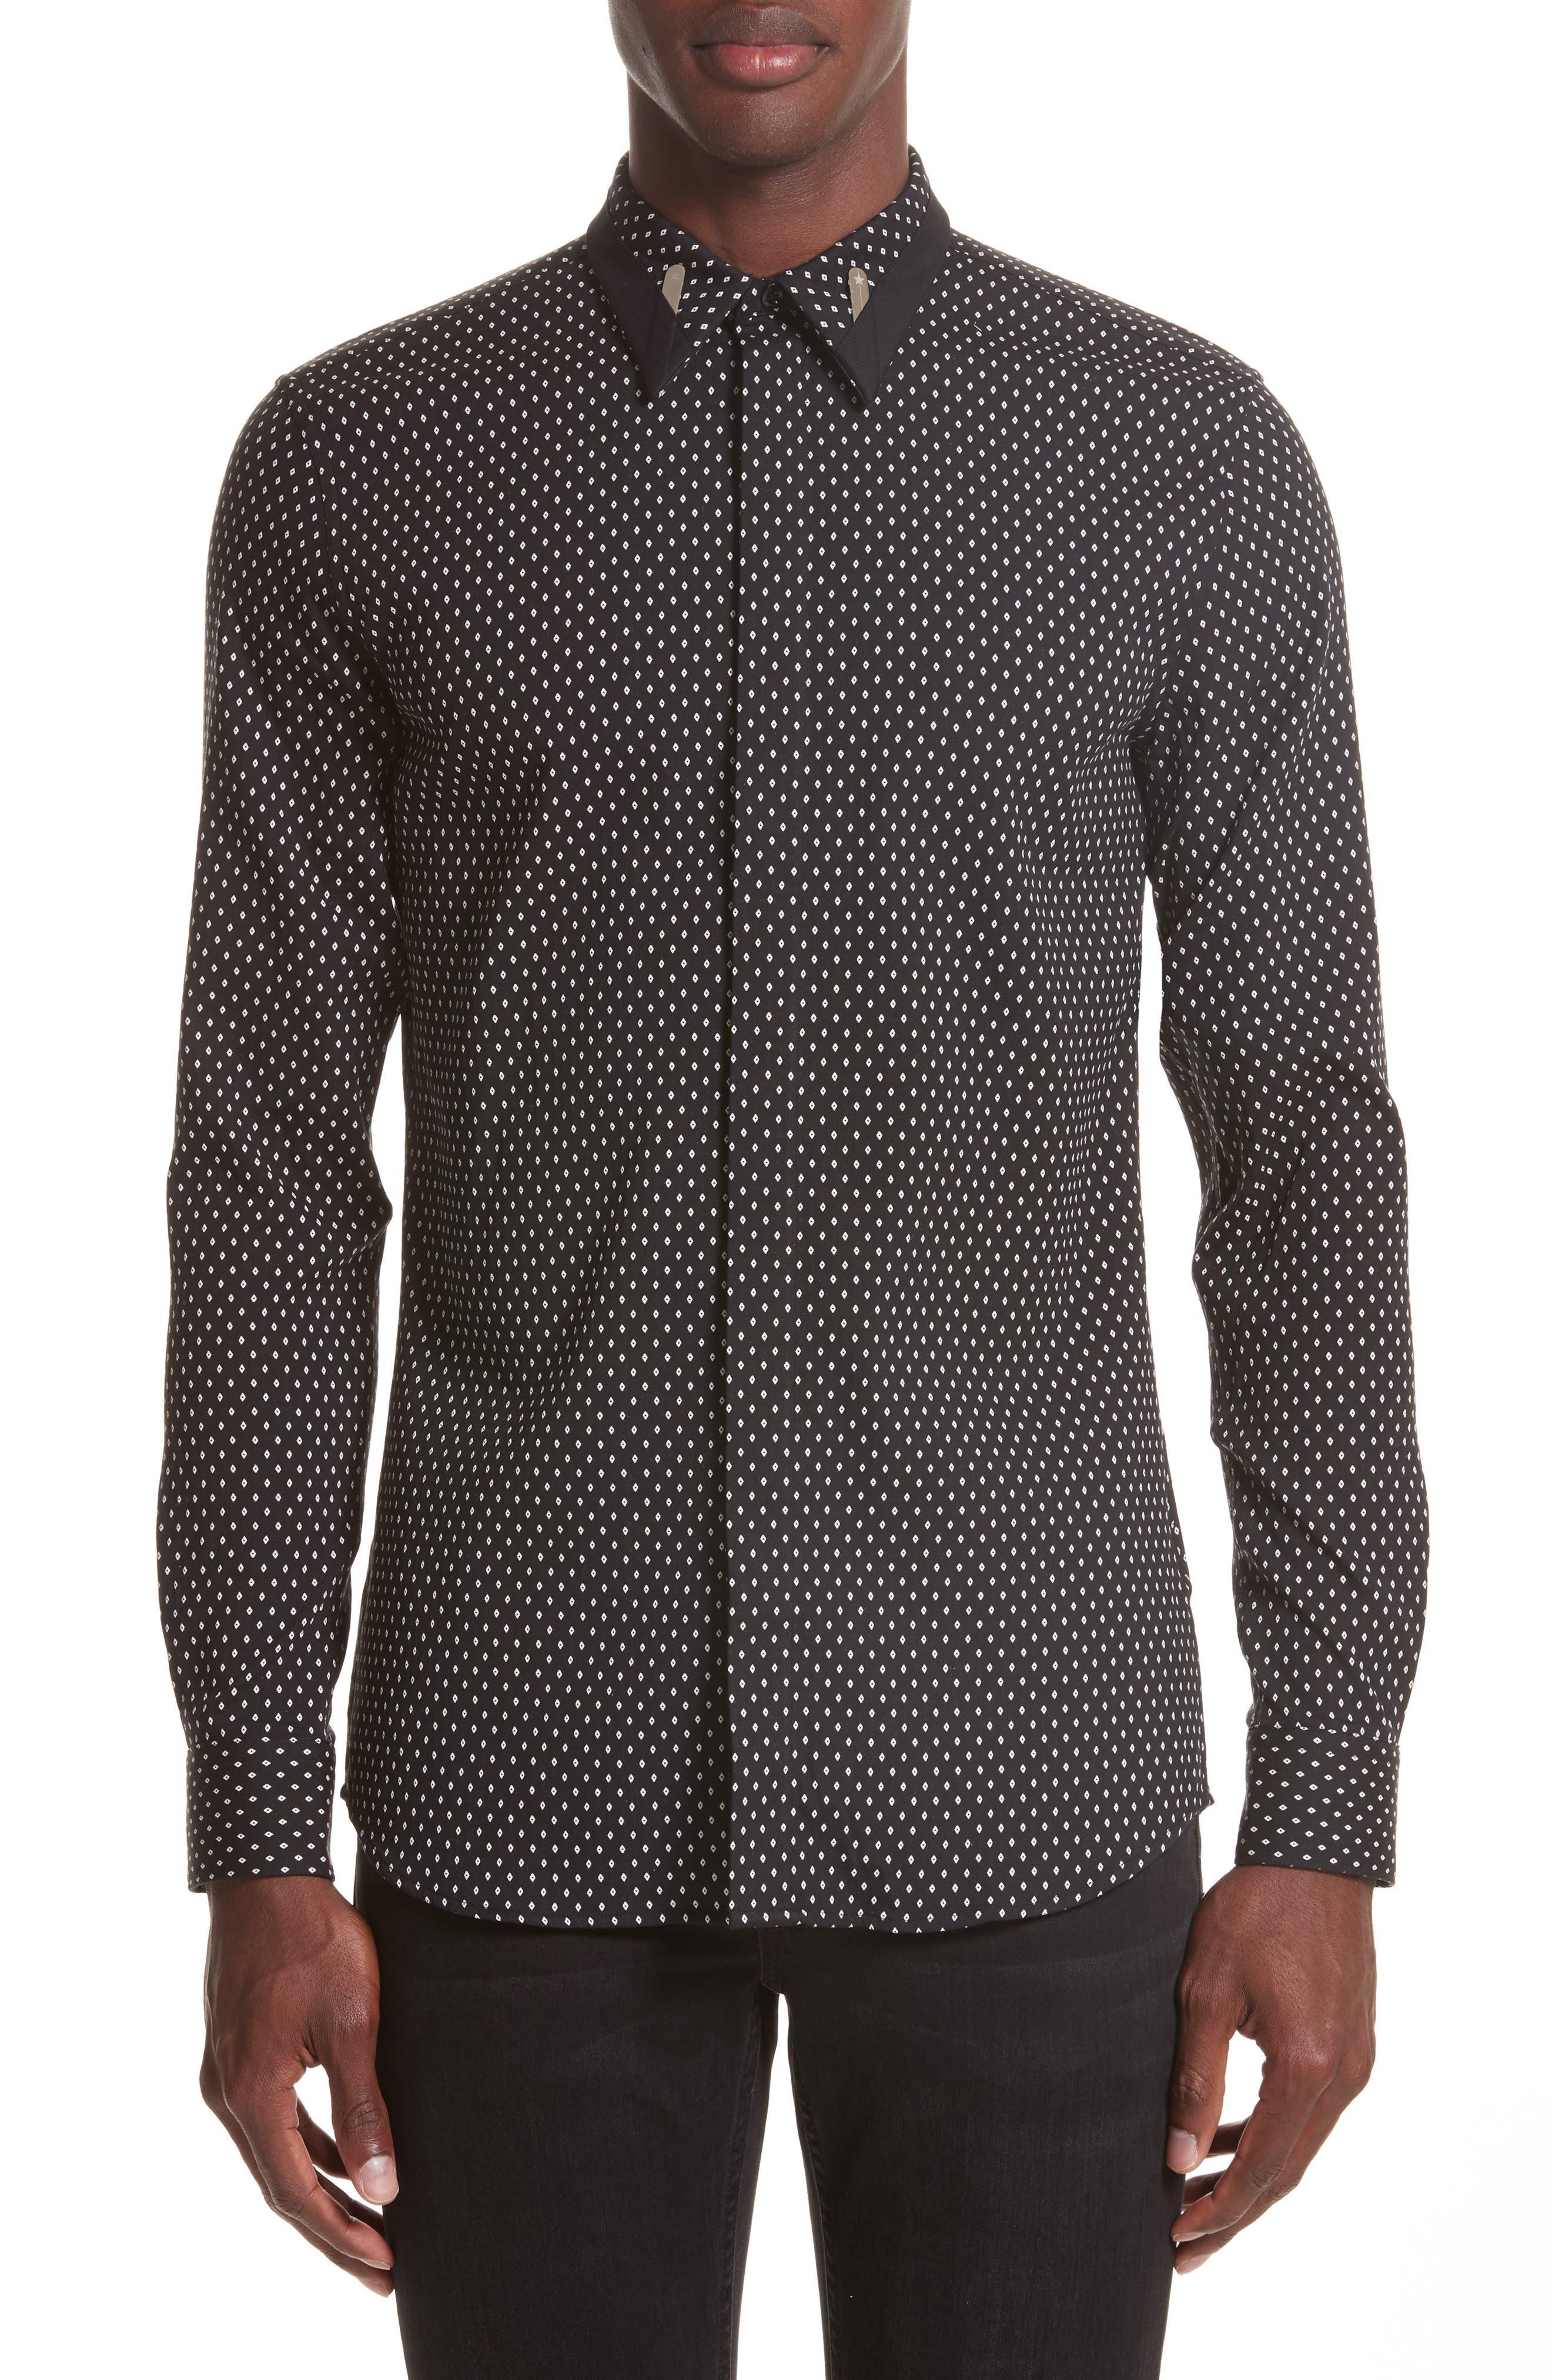 Alternate Image 1 Selected - Givenchy Jacquard Collar Stay Shirt